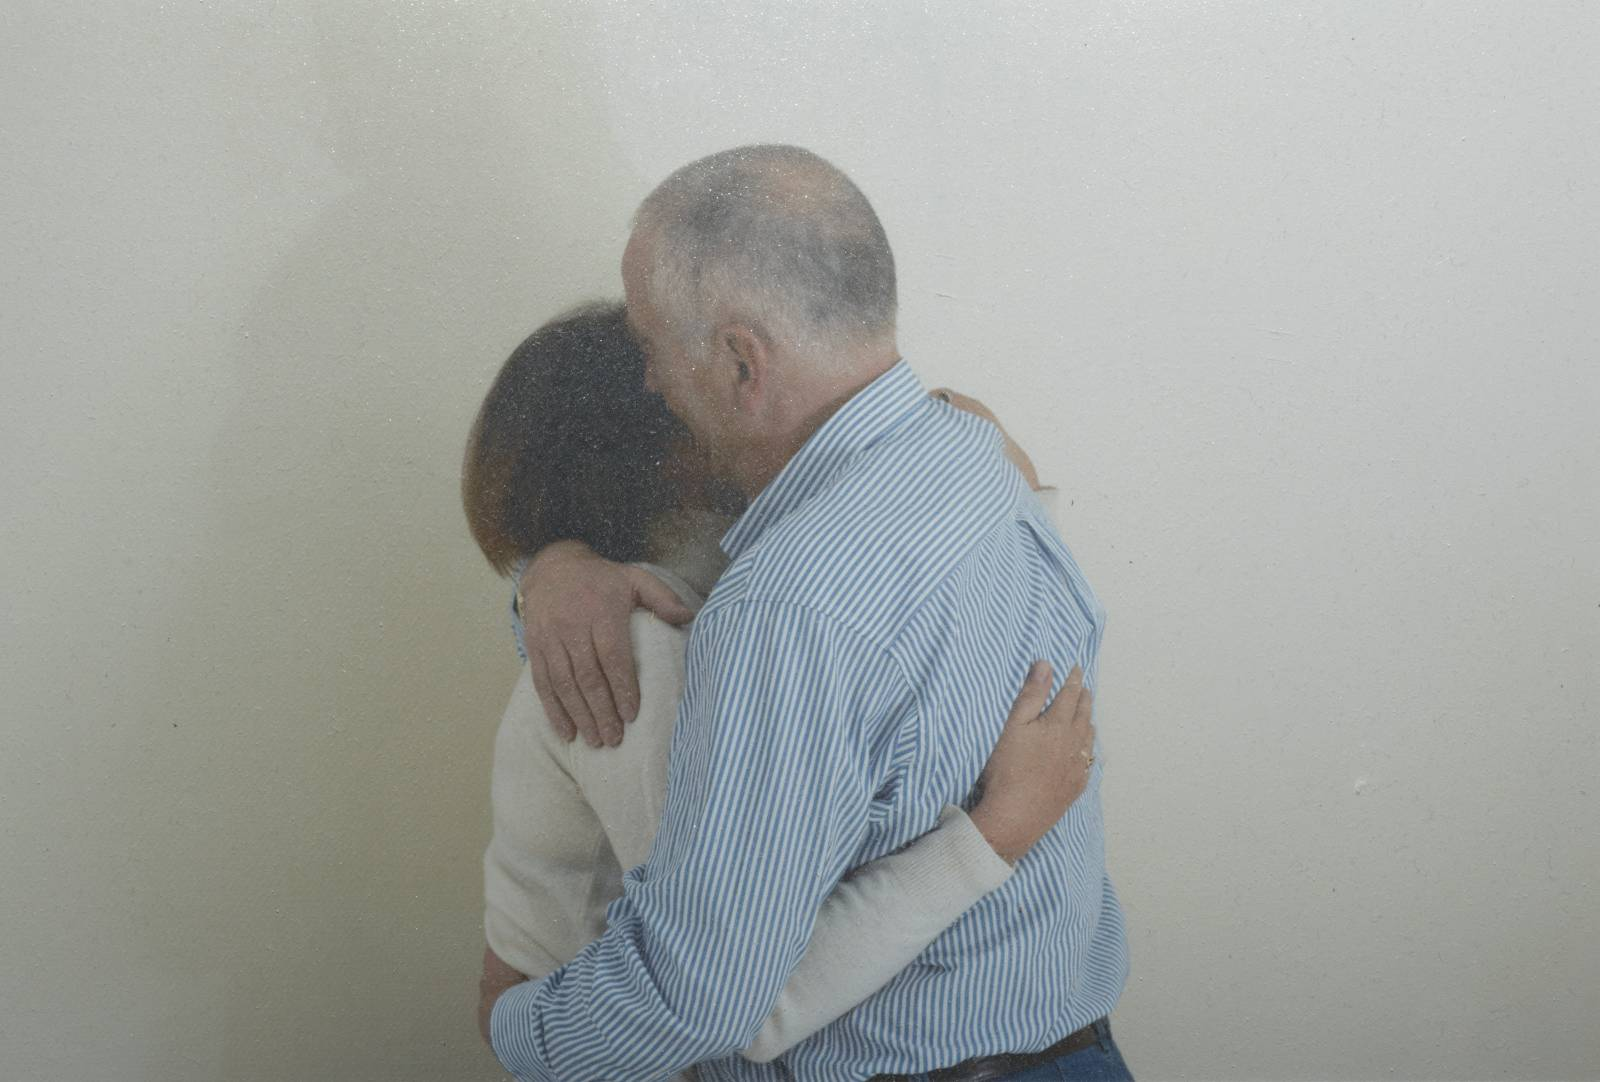 third party, 2010, C-print, 56 x 79,6 cm, ed. 5